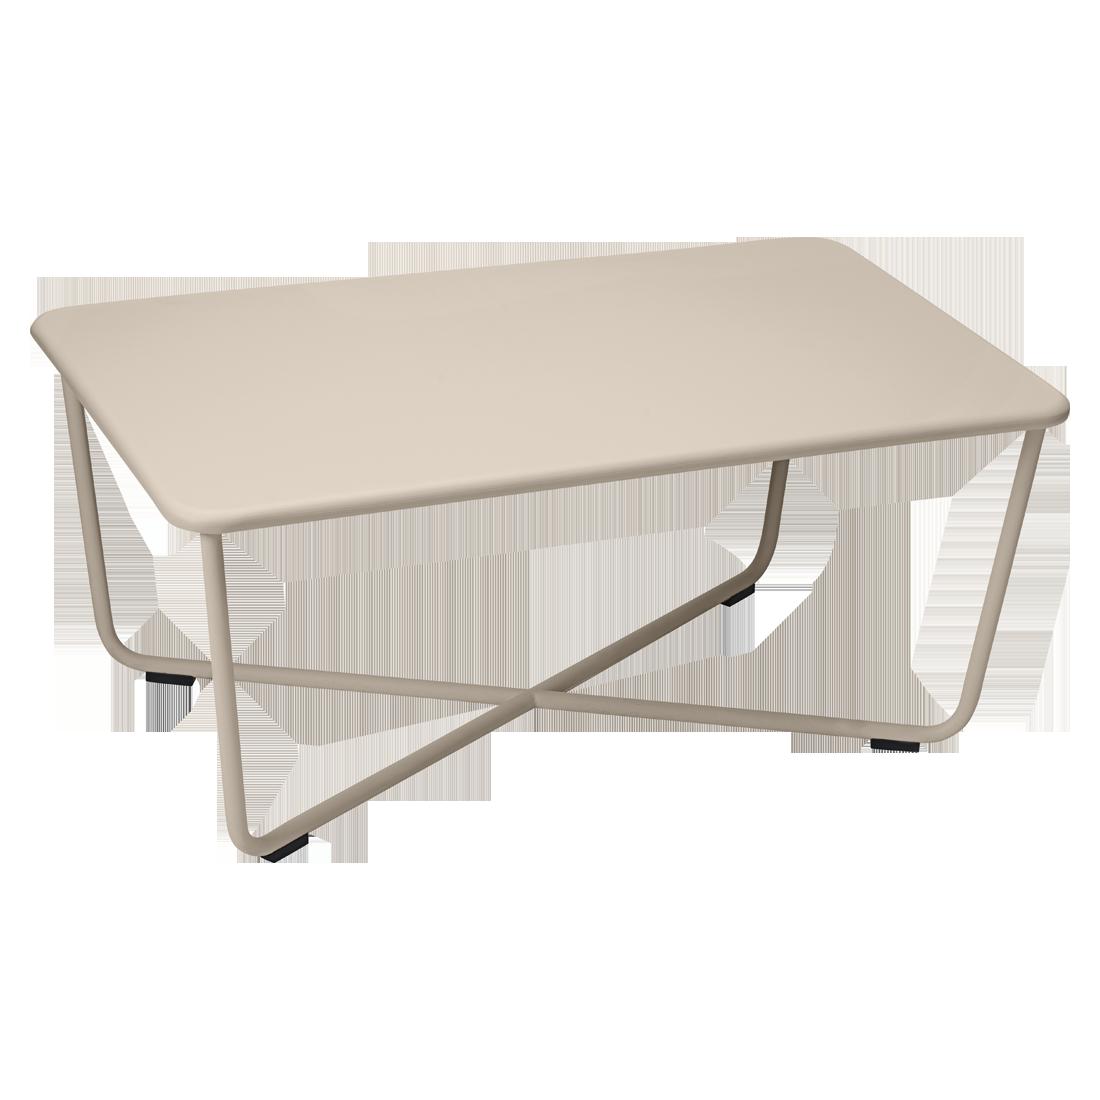 Table basse croisette de fermob muscade - Table basse fermob ...